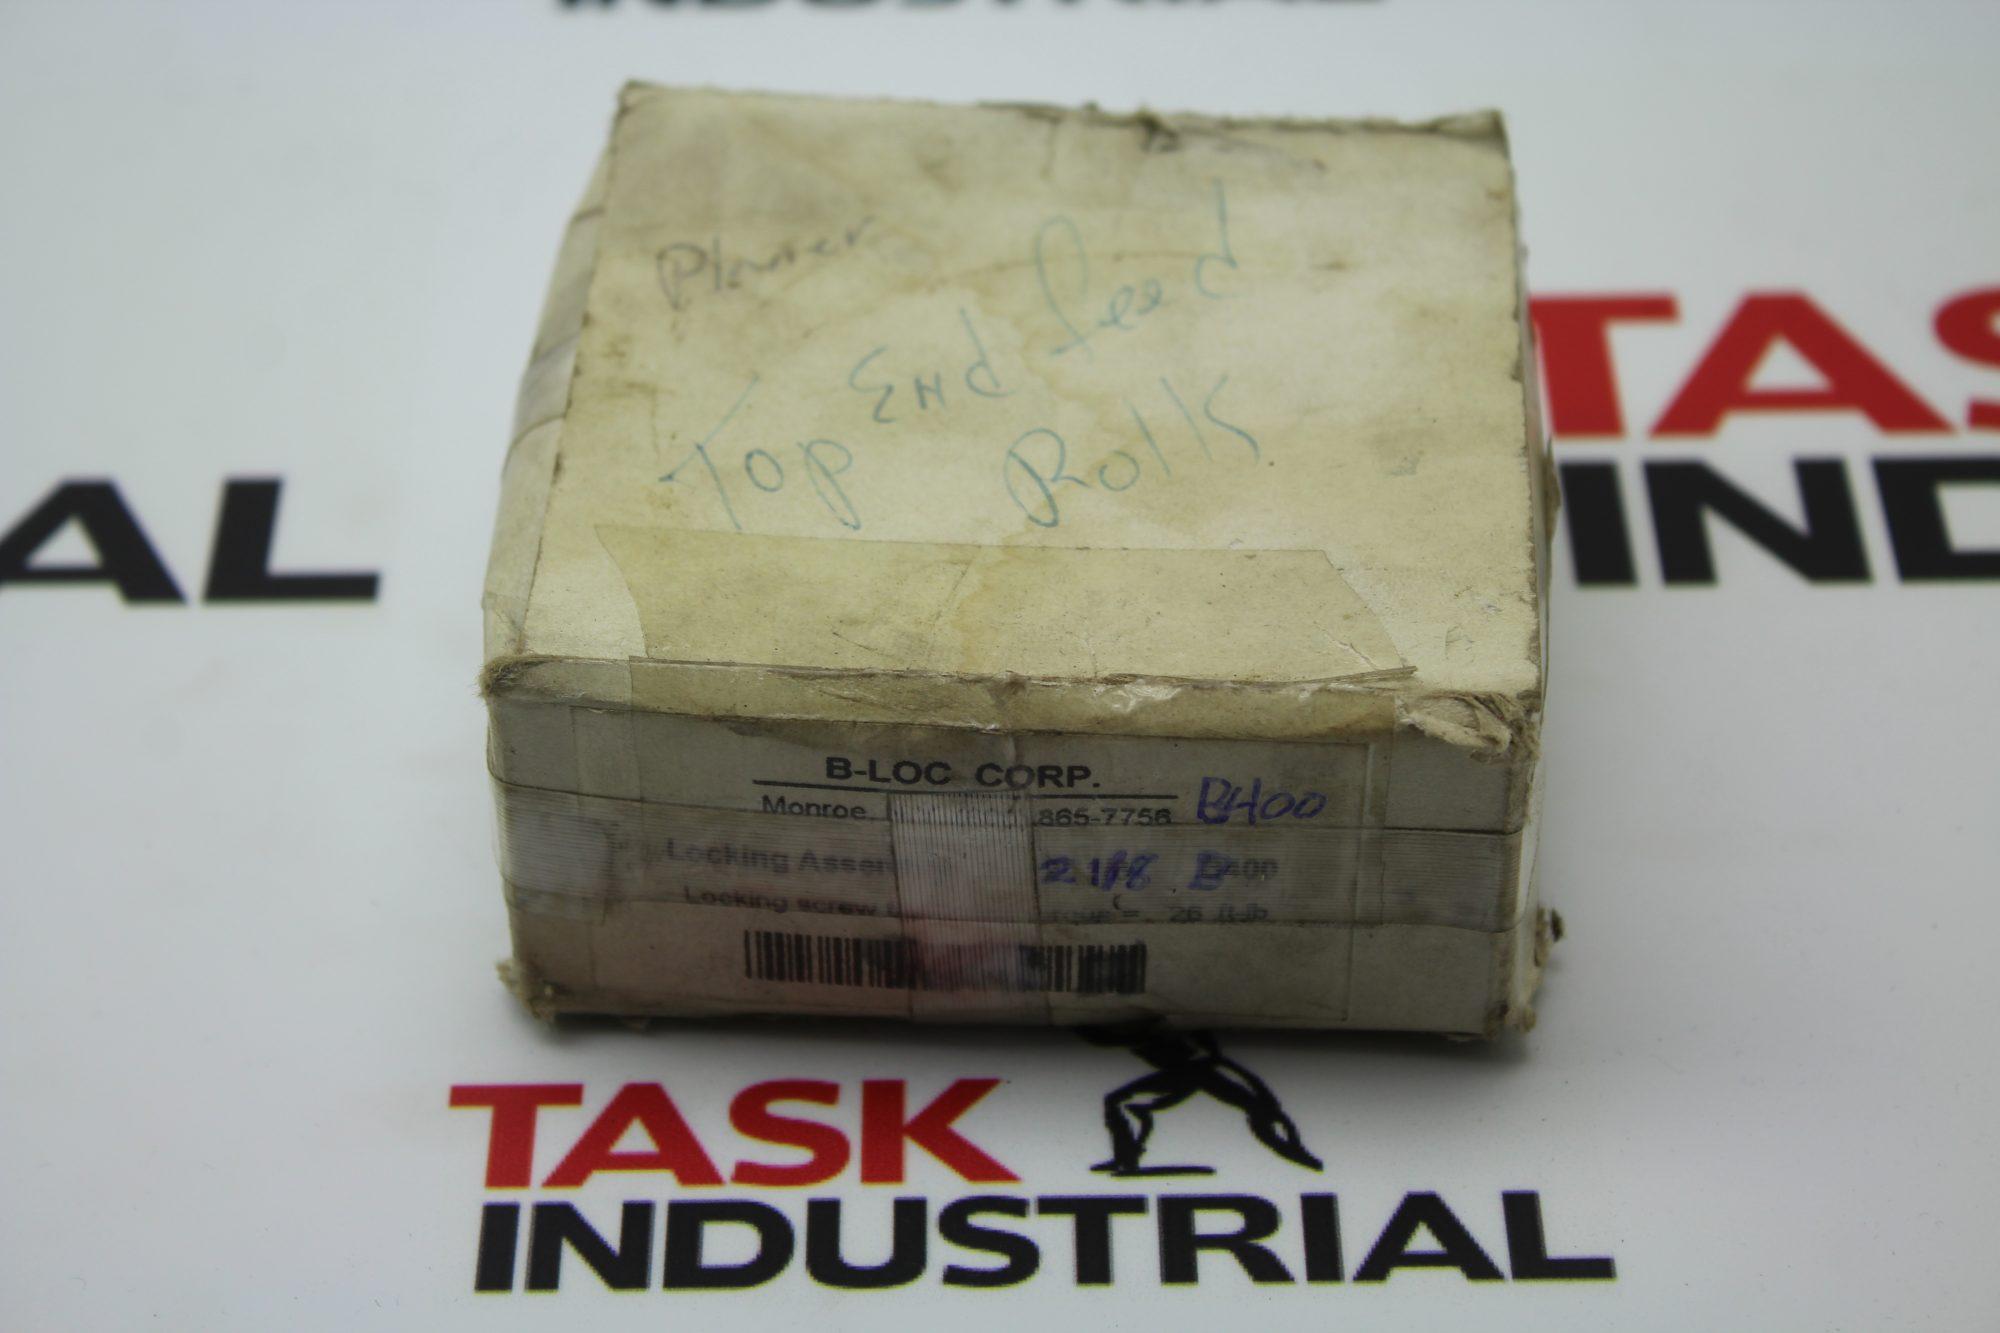 B-Loc Locking Assembly B400 2-1/8